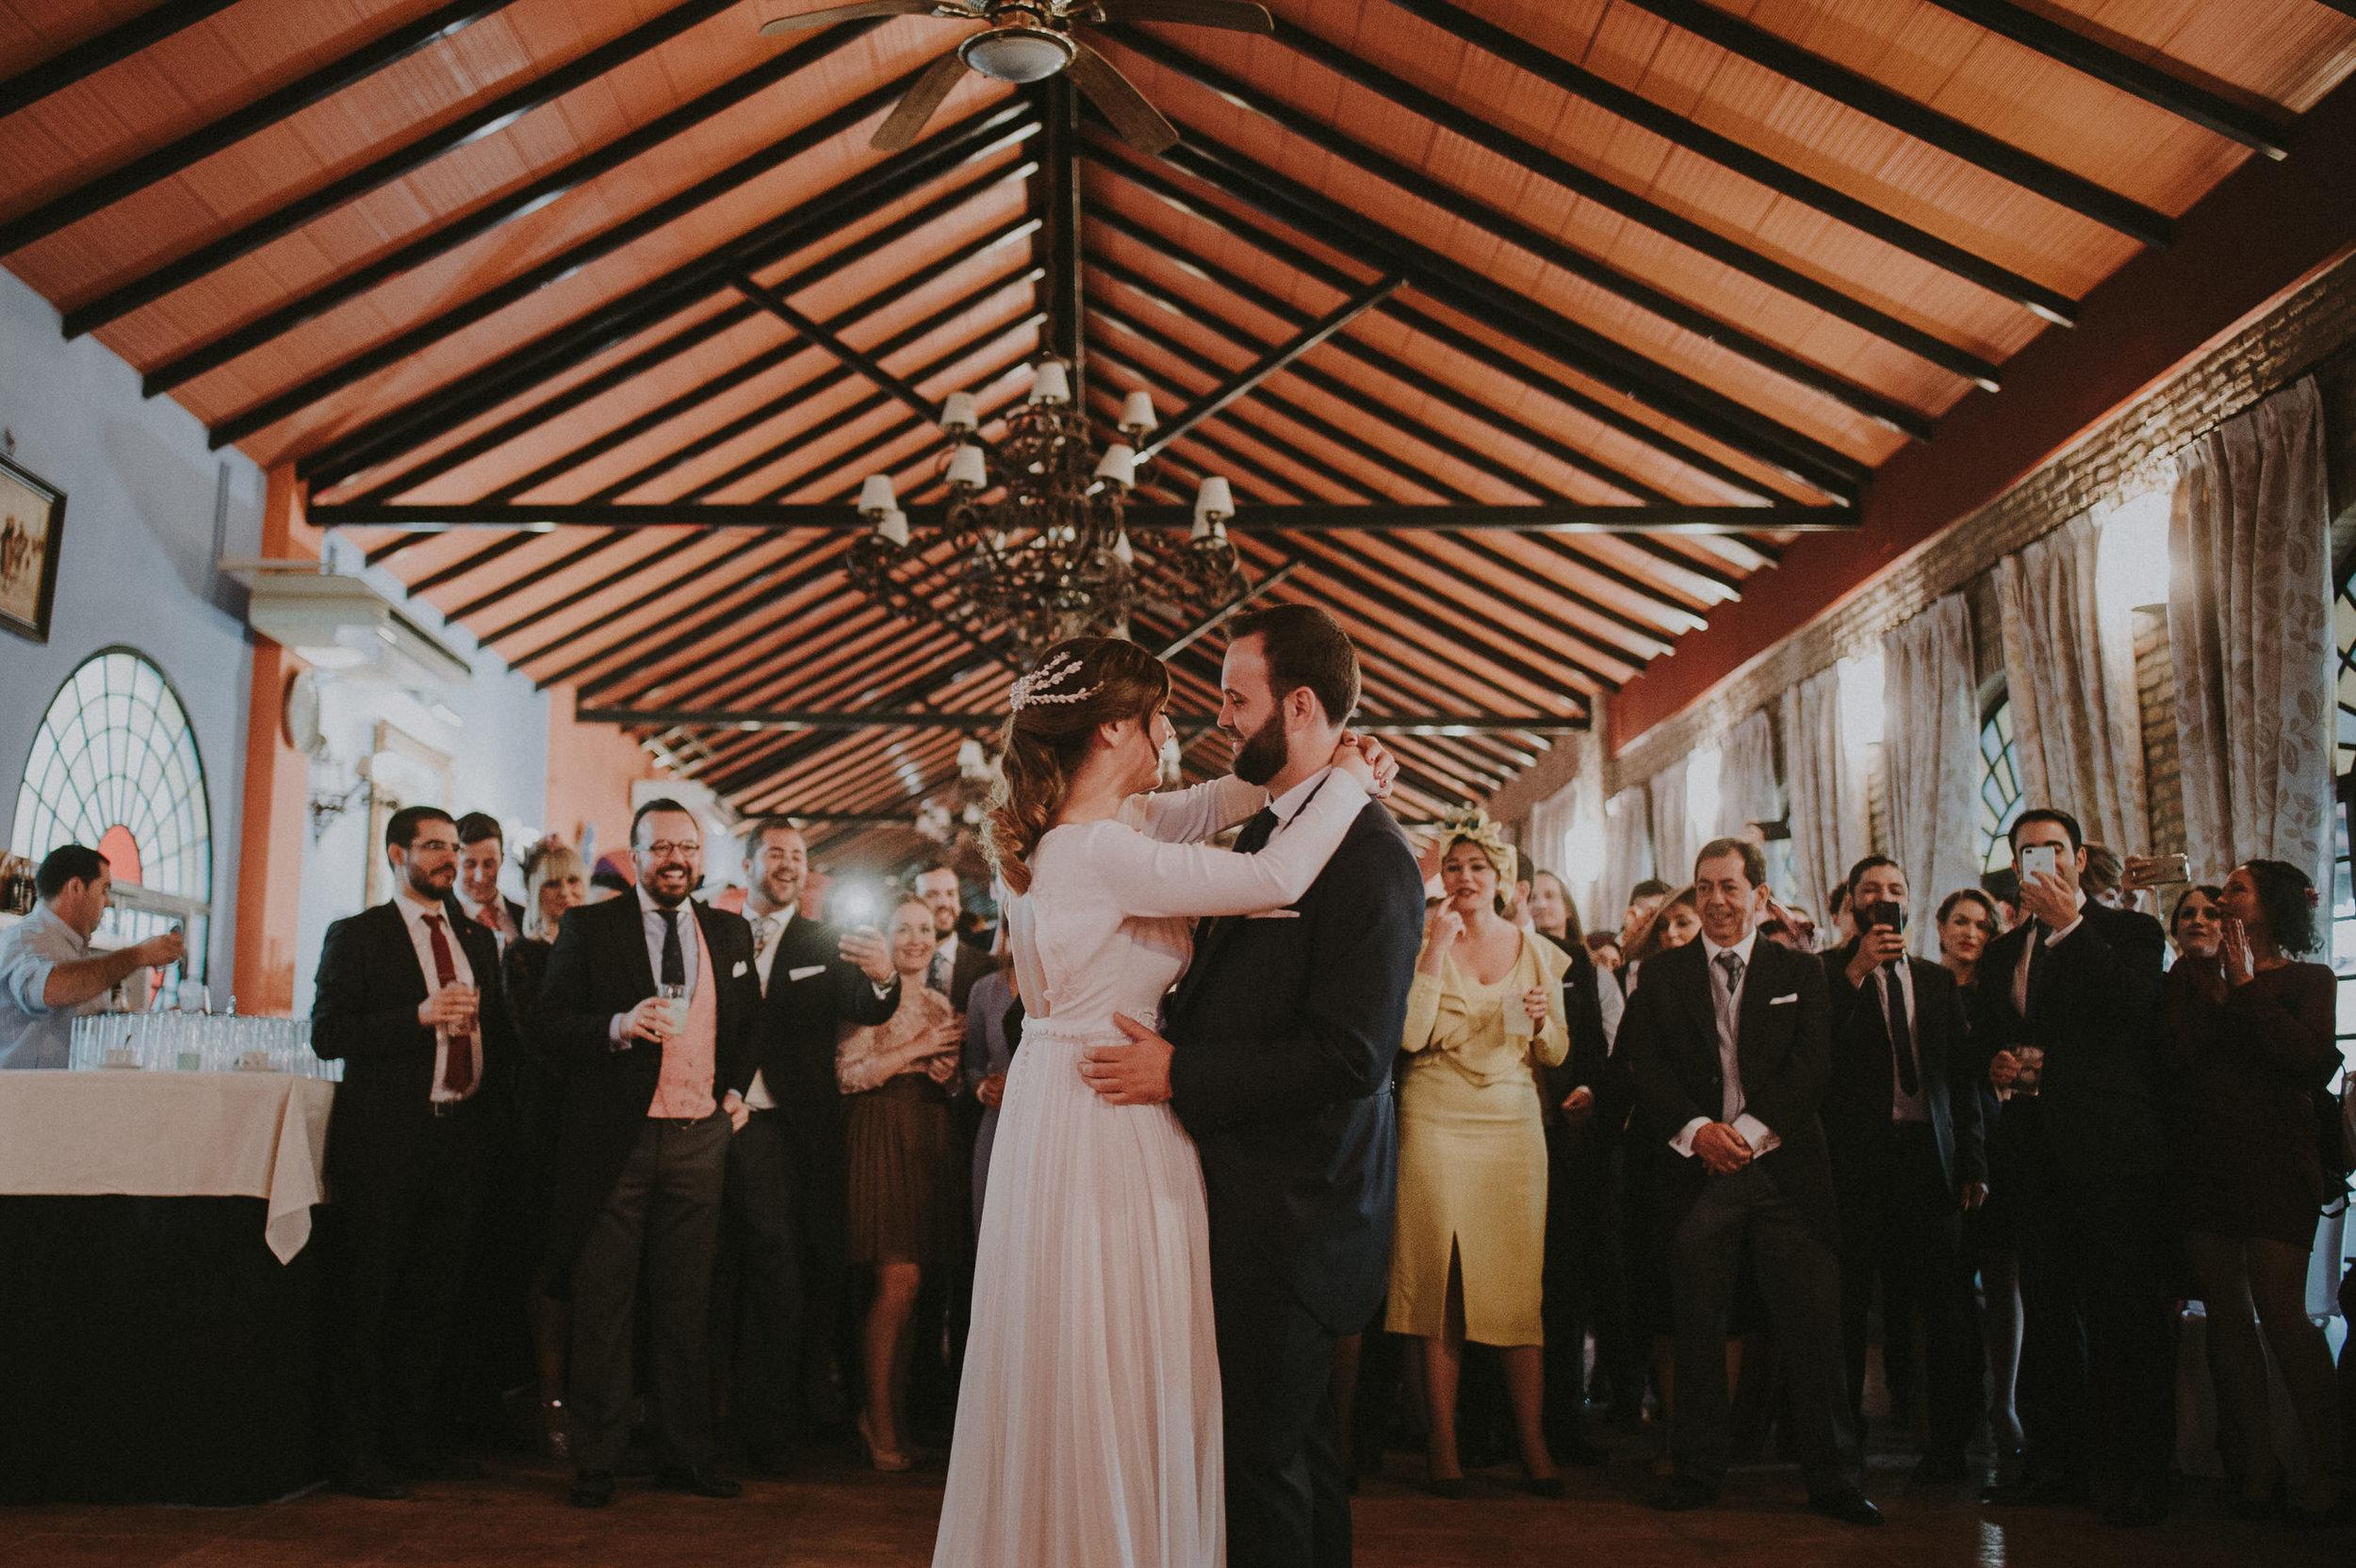 andres+amarillo+fotografo+boda+sevilla+santa+maria+de+la+blanca+al+yamanah (23).JPG